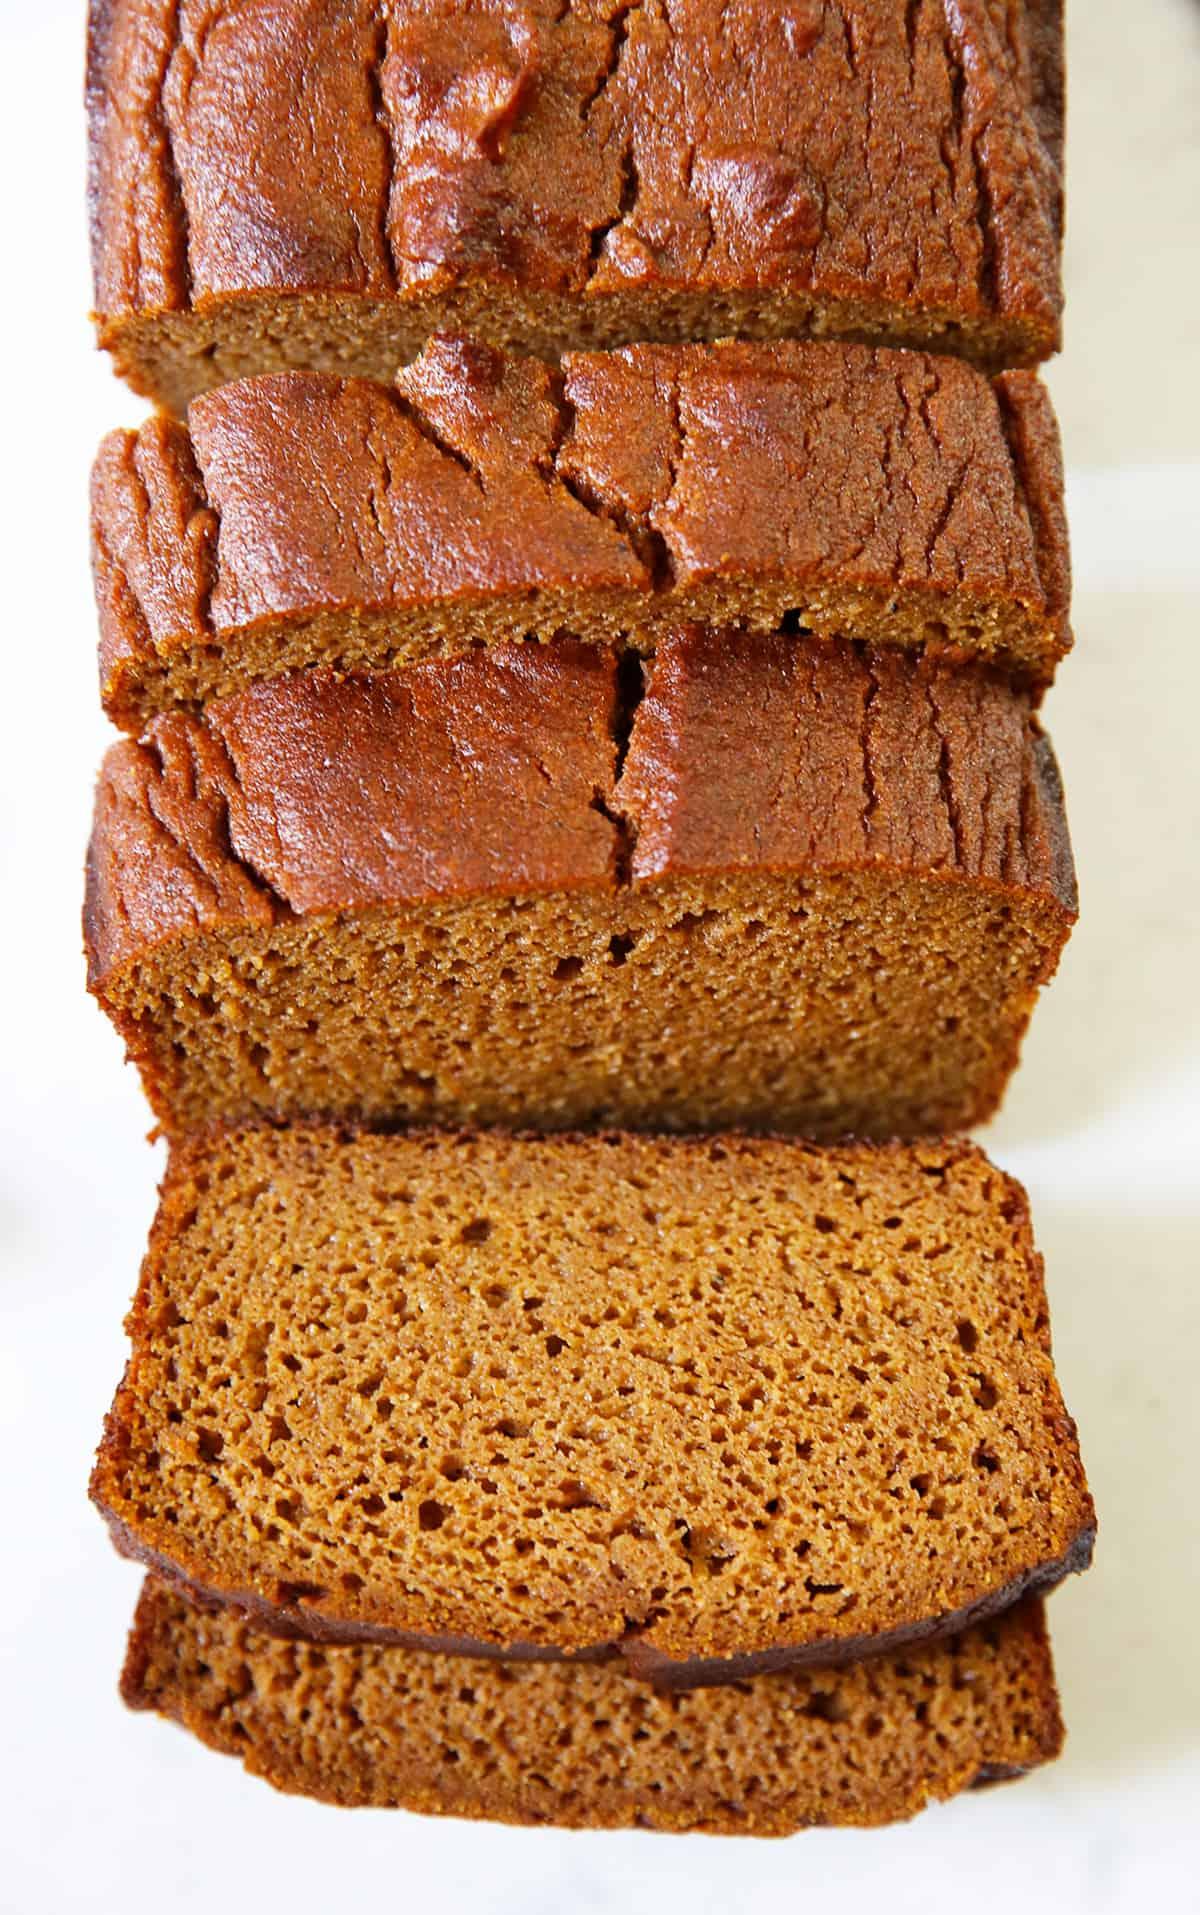 Sliced gluten free pumpkin bread